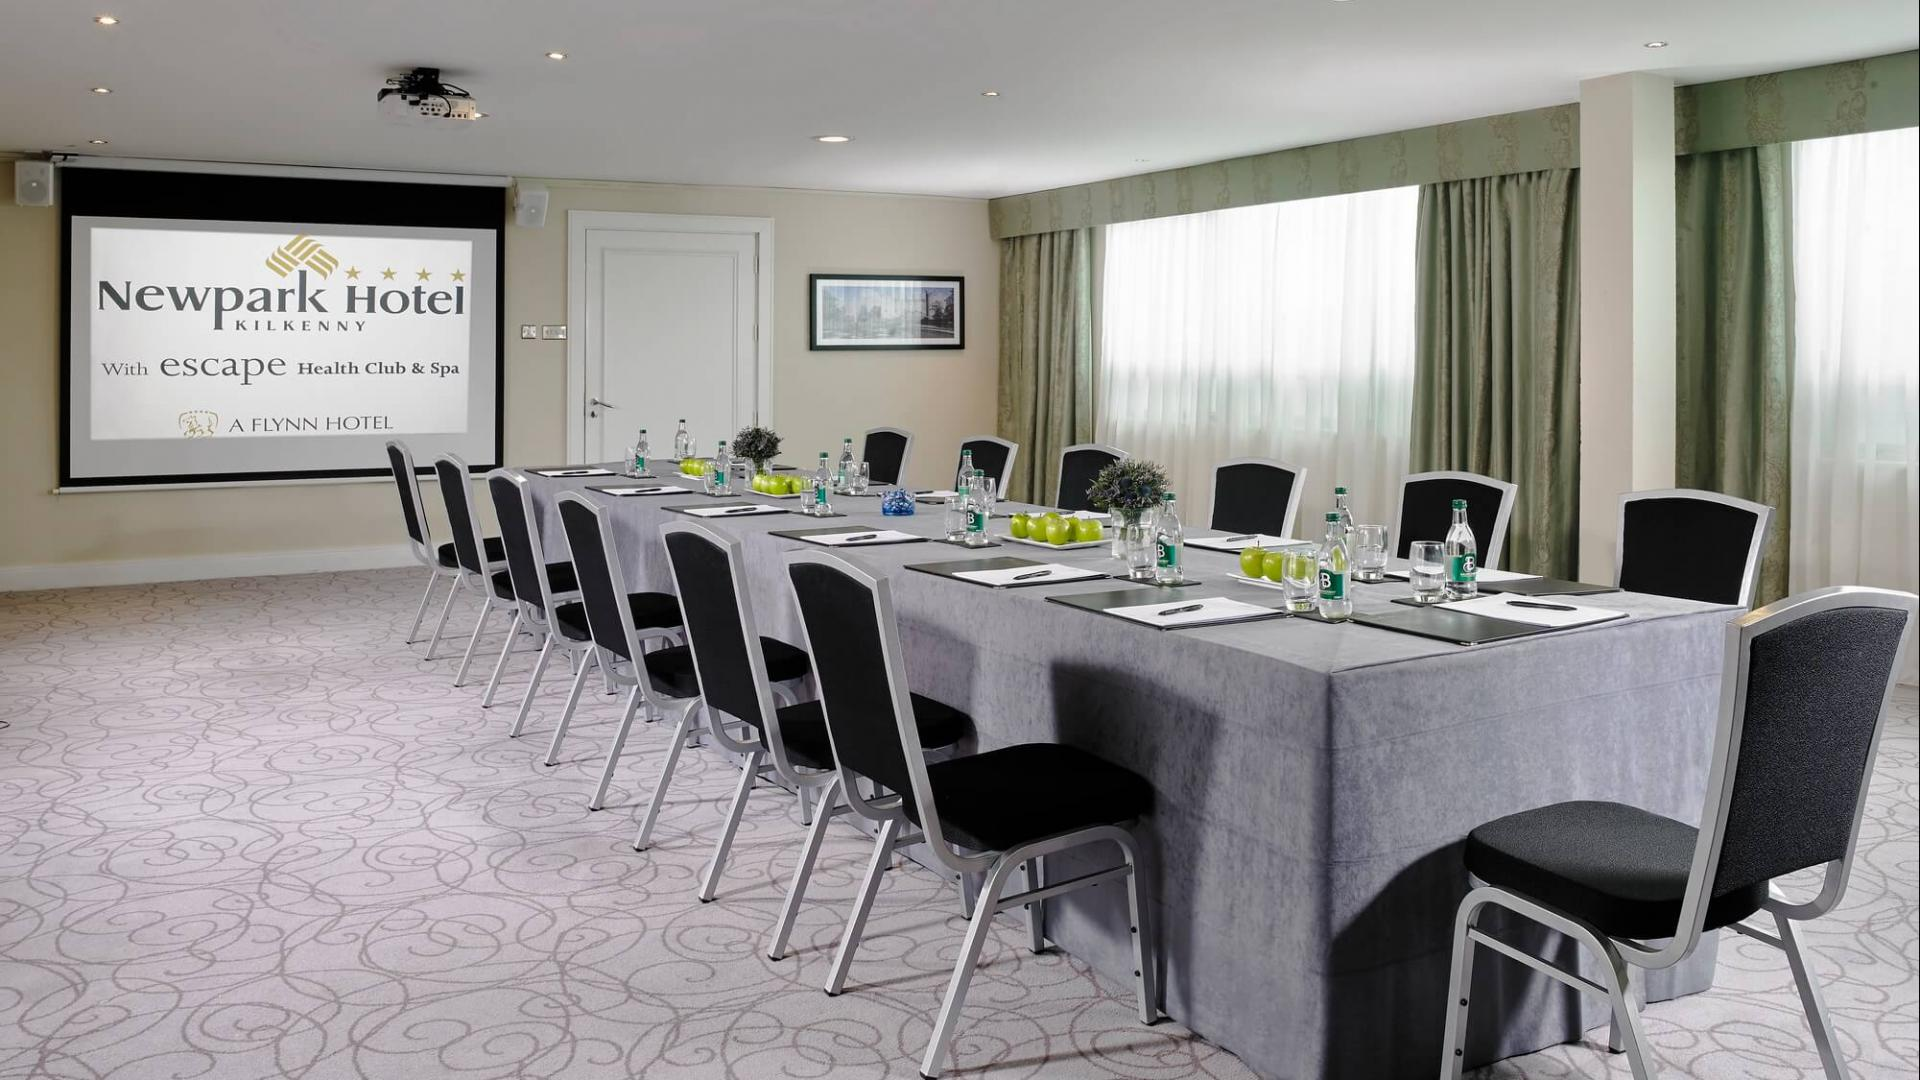 Conference Venues in Kilkenny | Conference Hotels Kilkenny